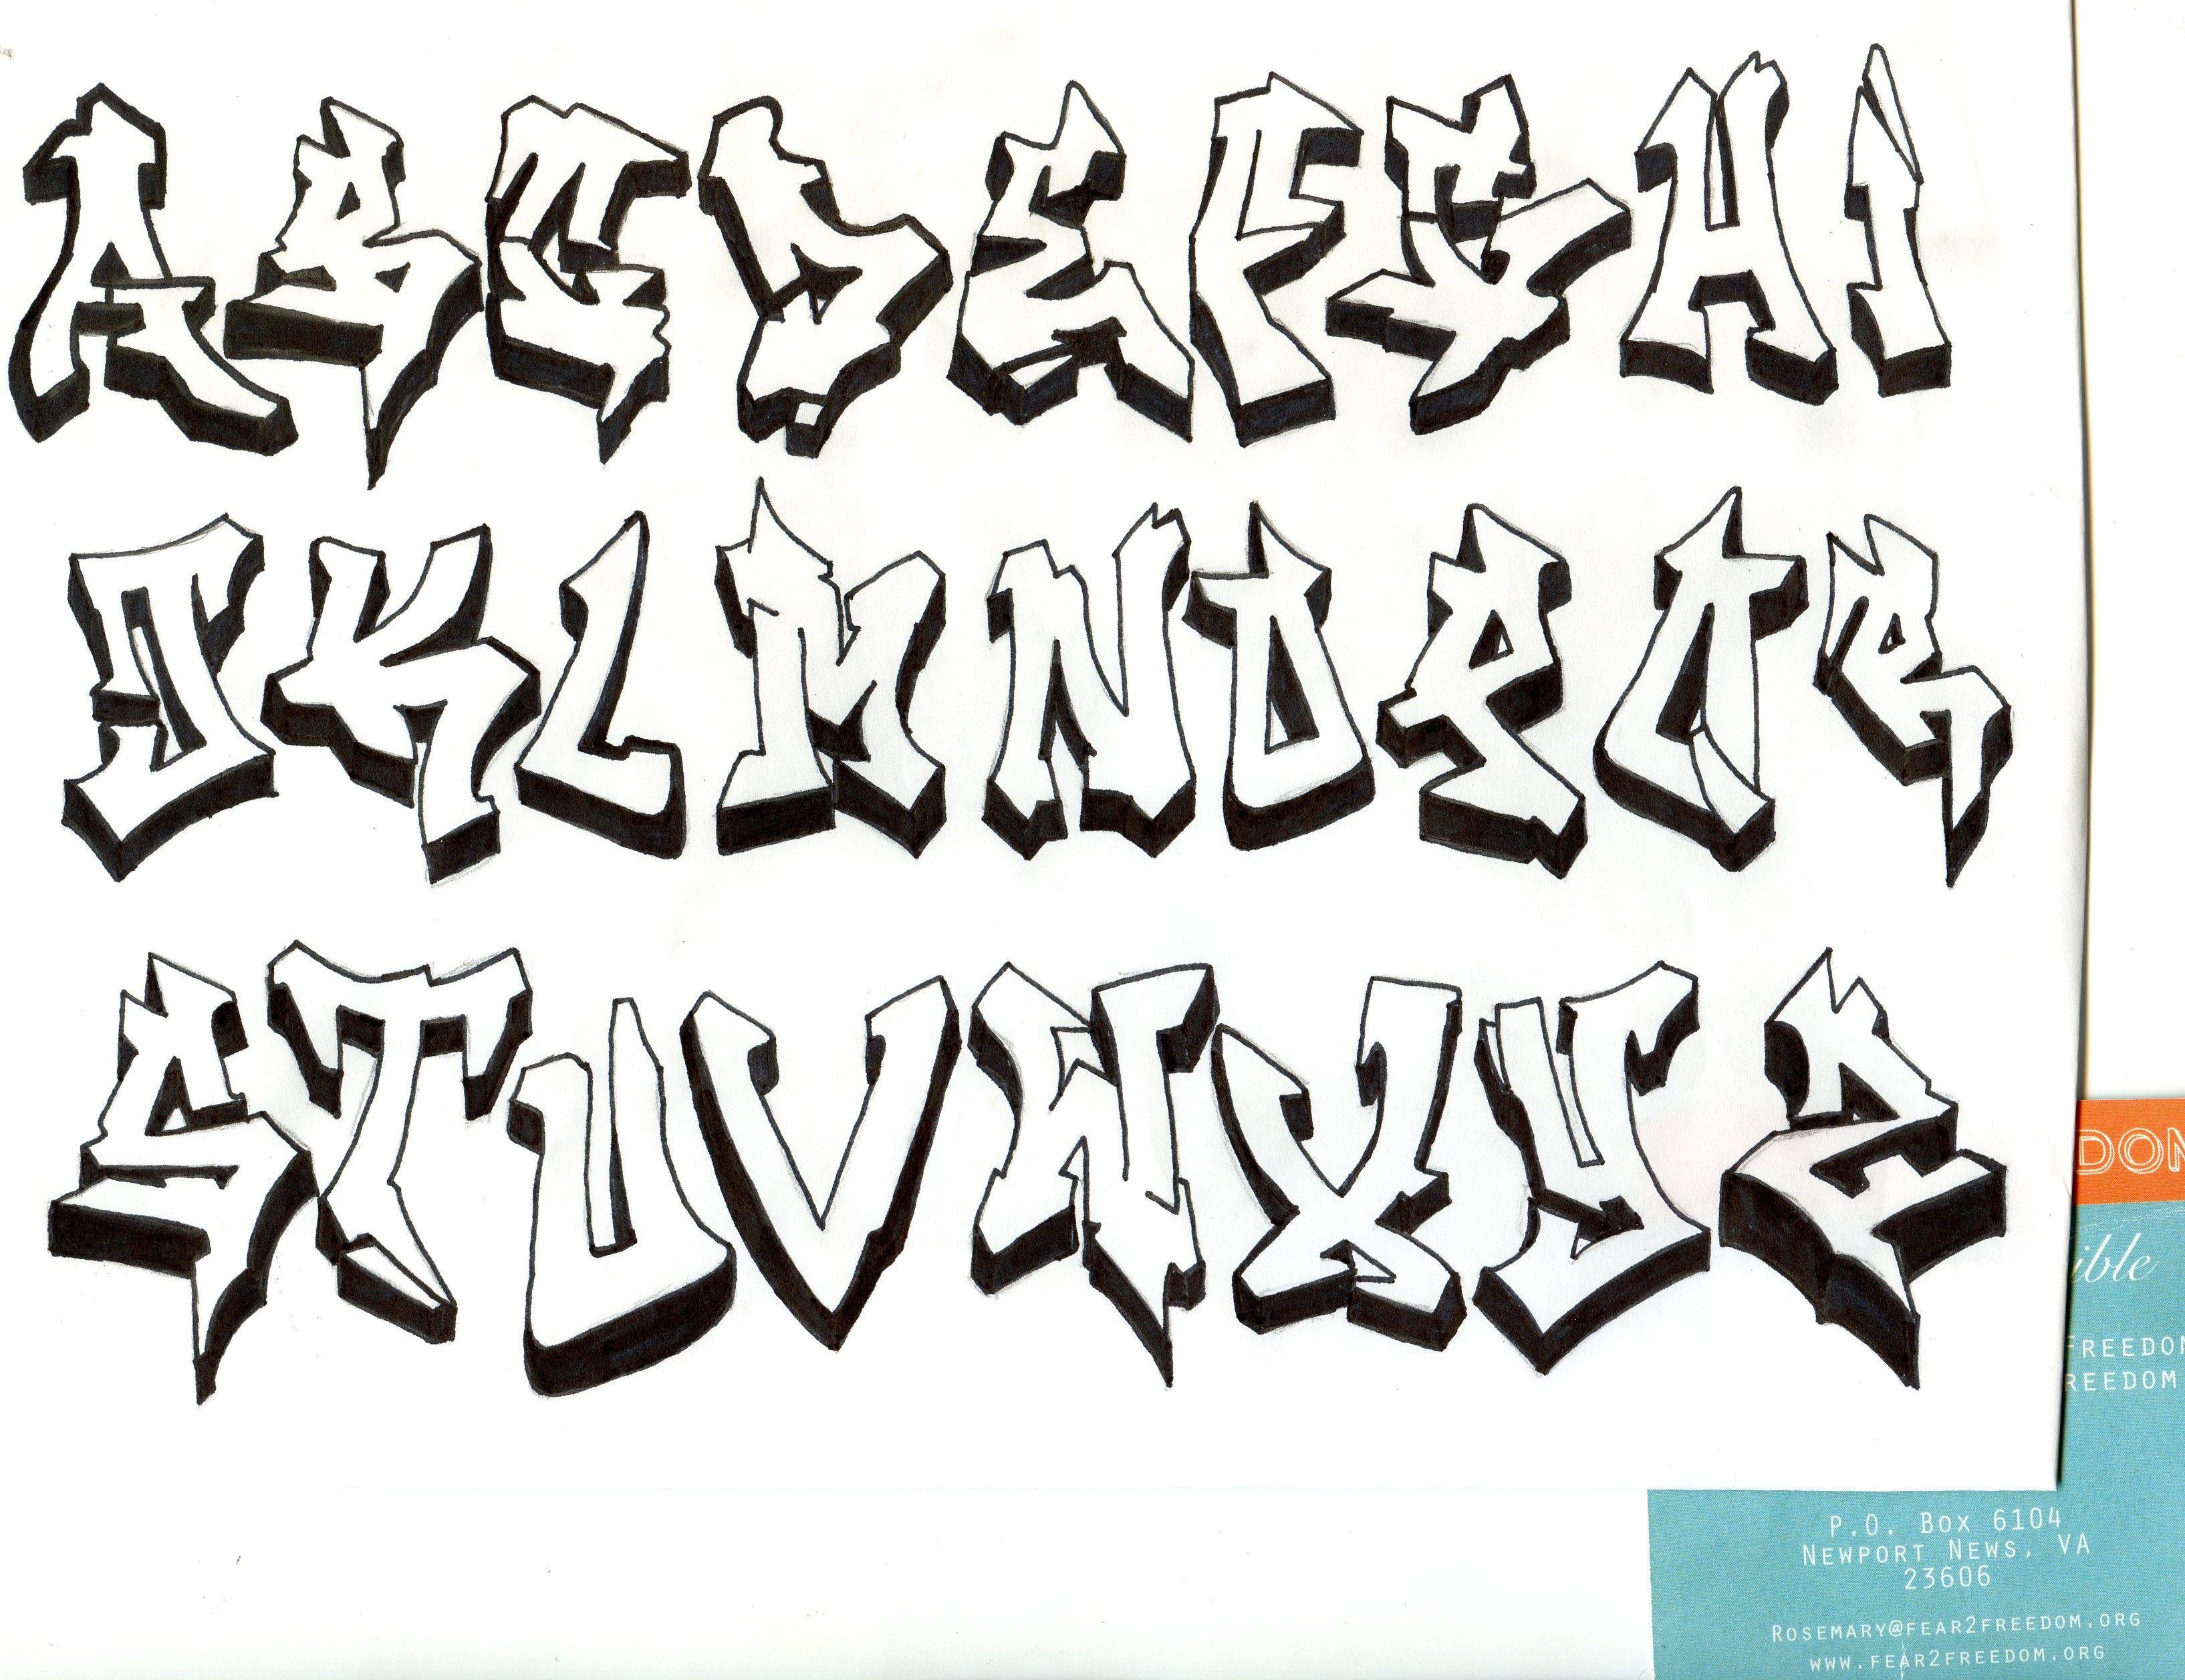 graffiti alphabet block style - Buscar con Google | Graffiti